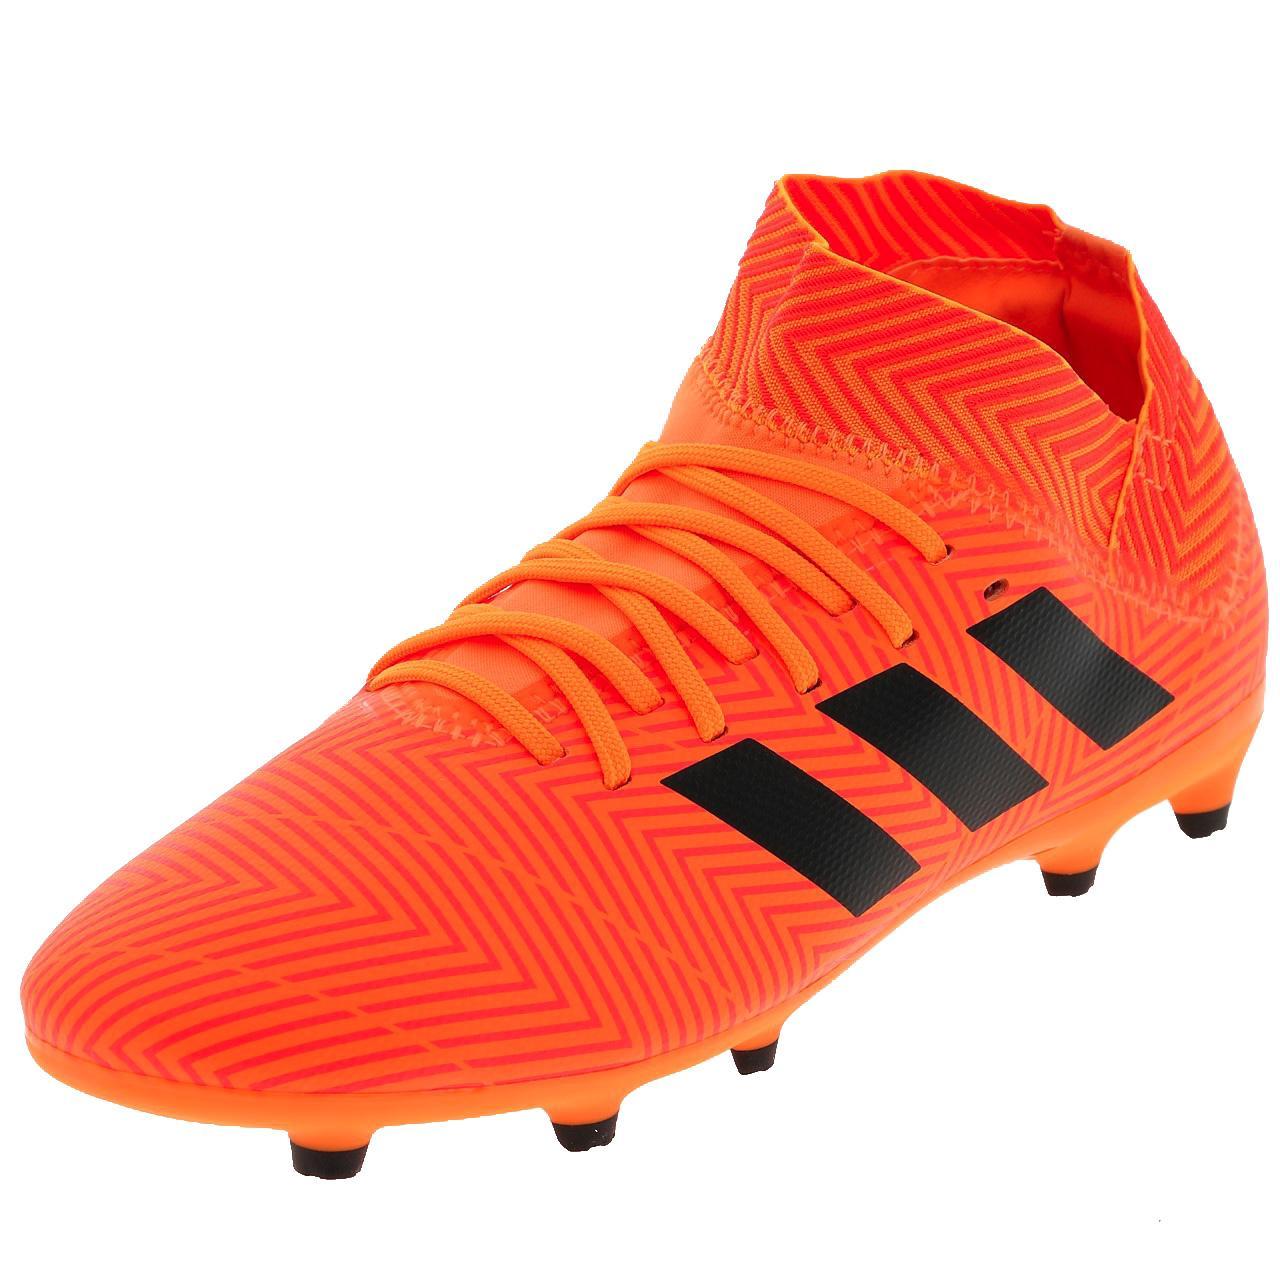 CHAUSSURES FOOTBALL LAMELLES Adidas Nemeziz 18.3 fg jr